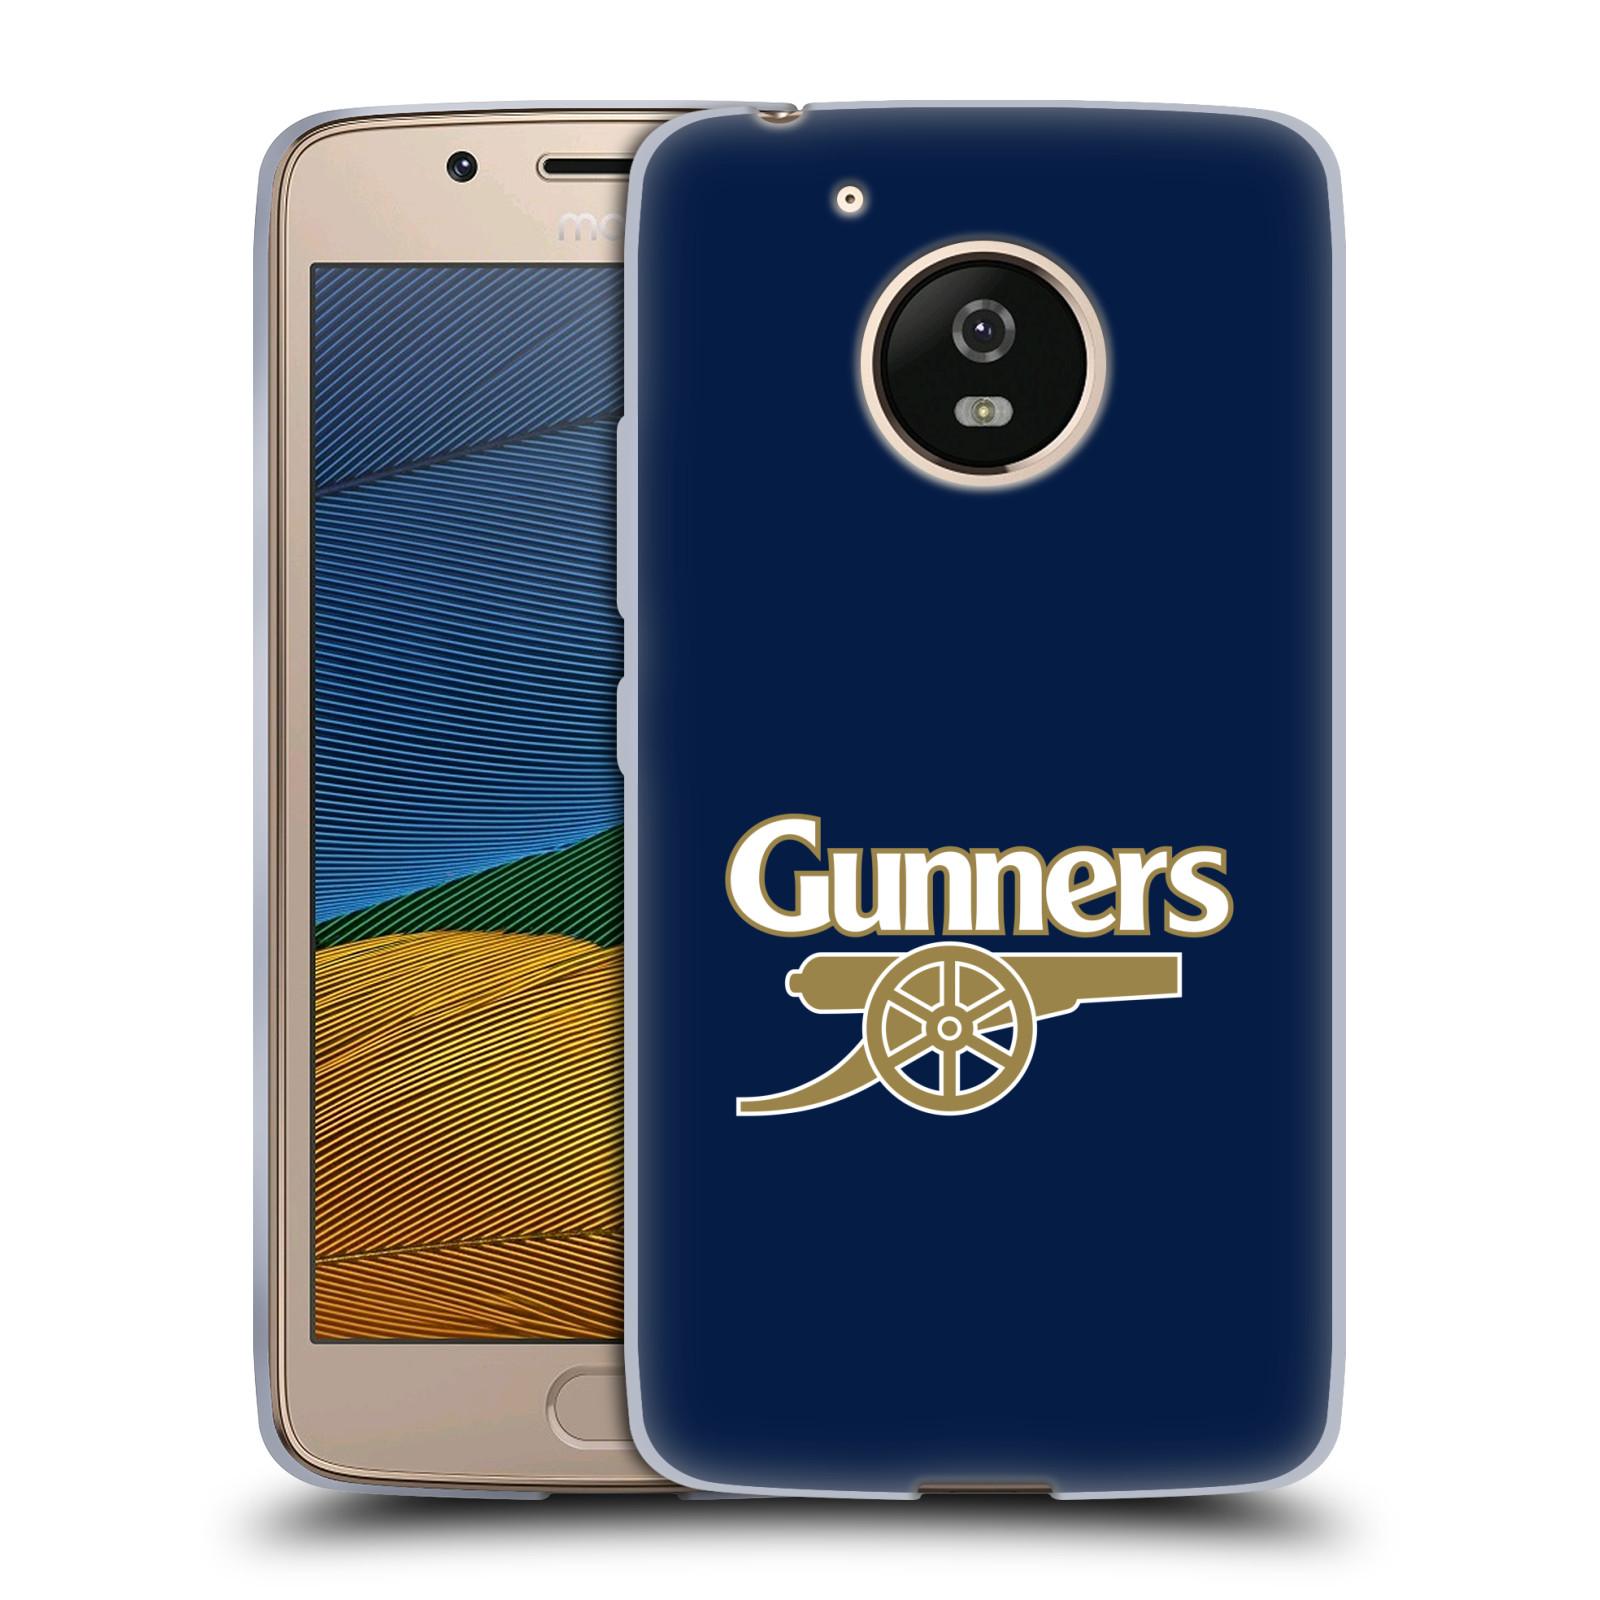 Silikonové pouzdro na mobil Lenovo Moto G5 - Head Case - Arsenal FC - Gunners